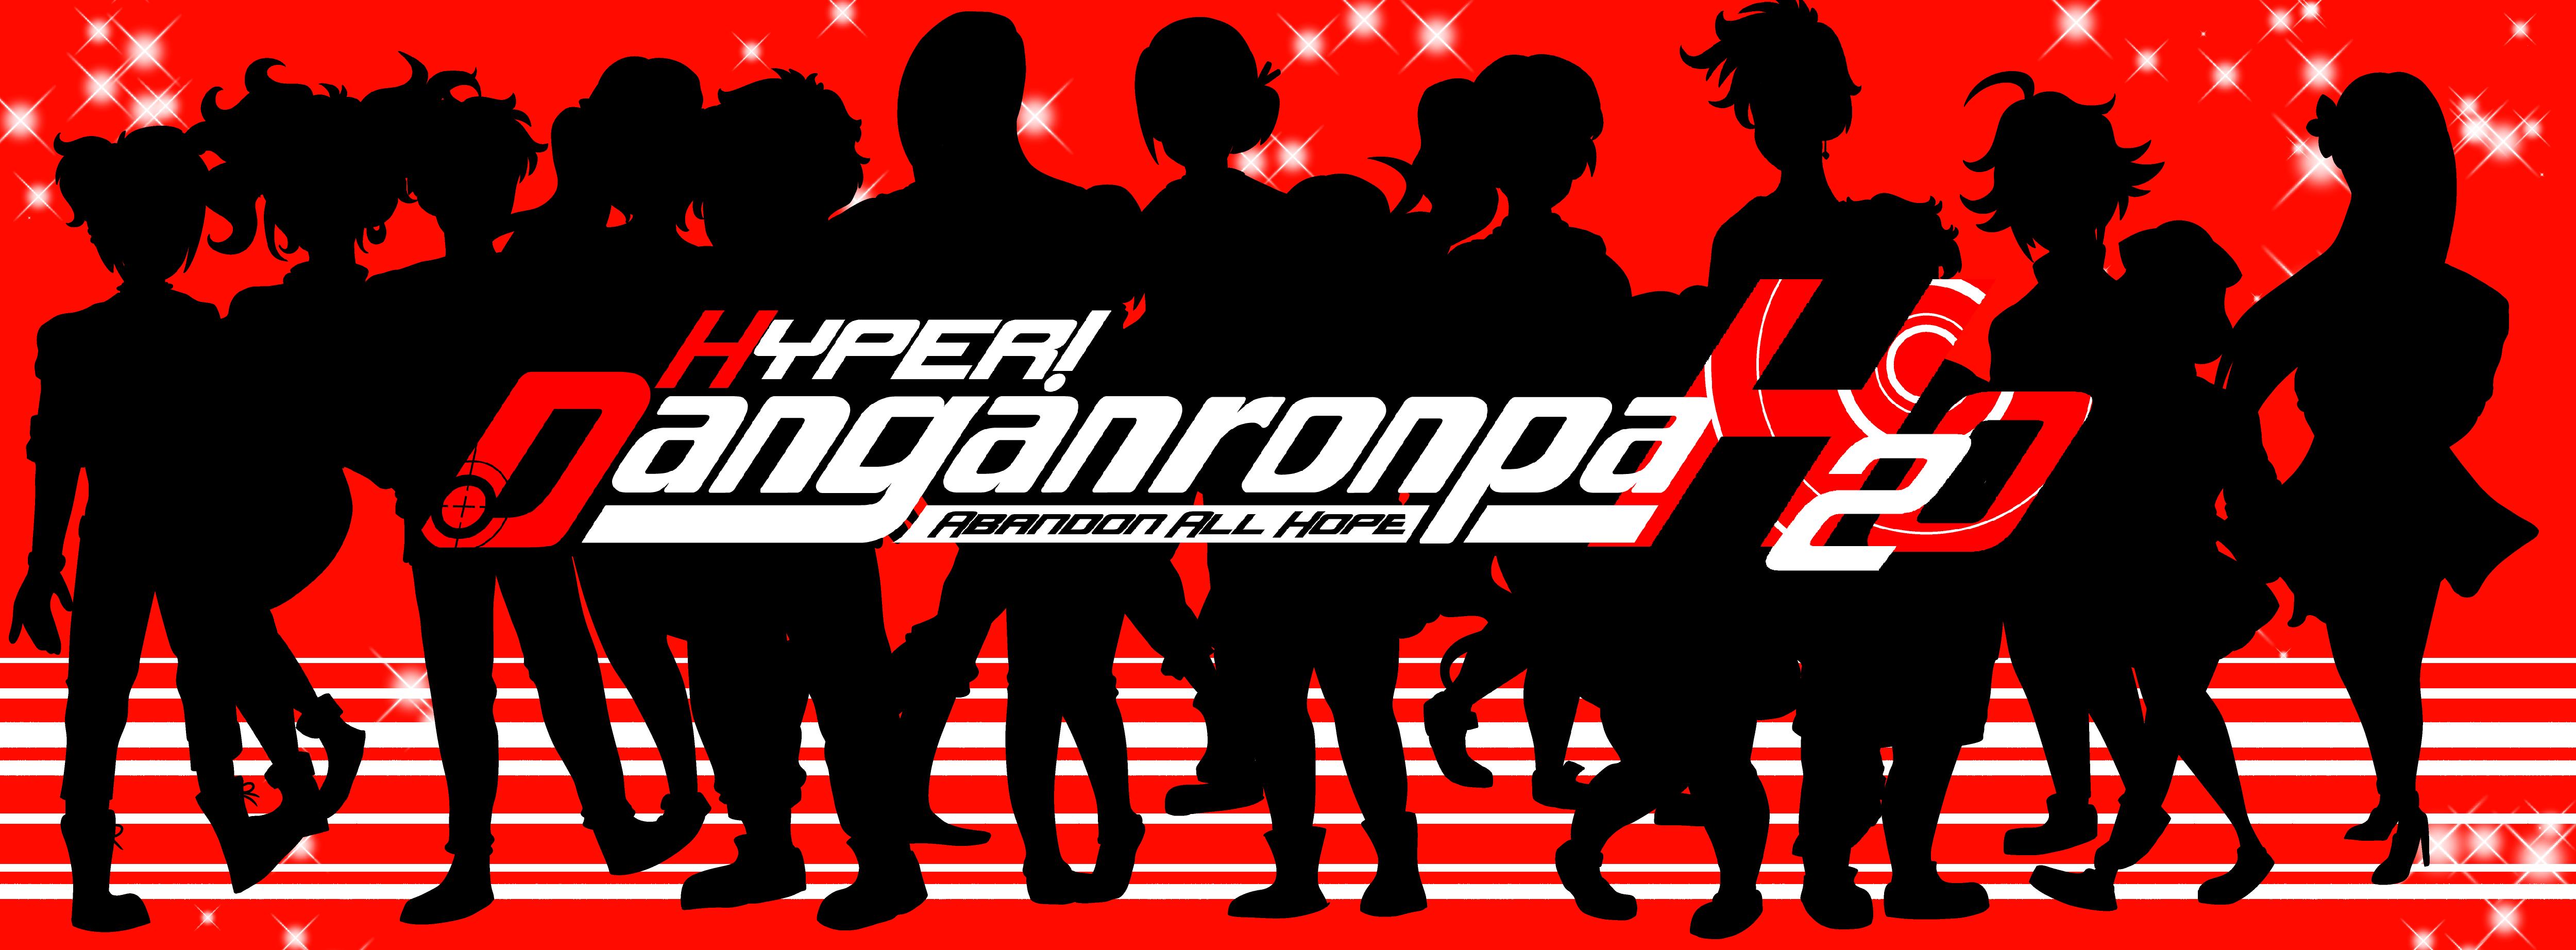 Danganronpa H20: Episode 2 by Nick Milkpunches